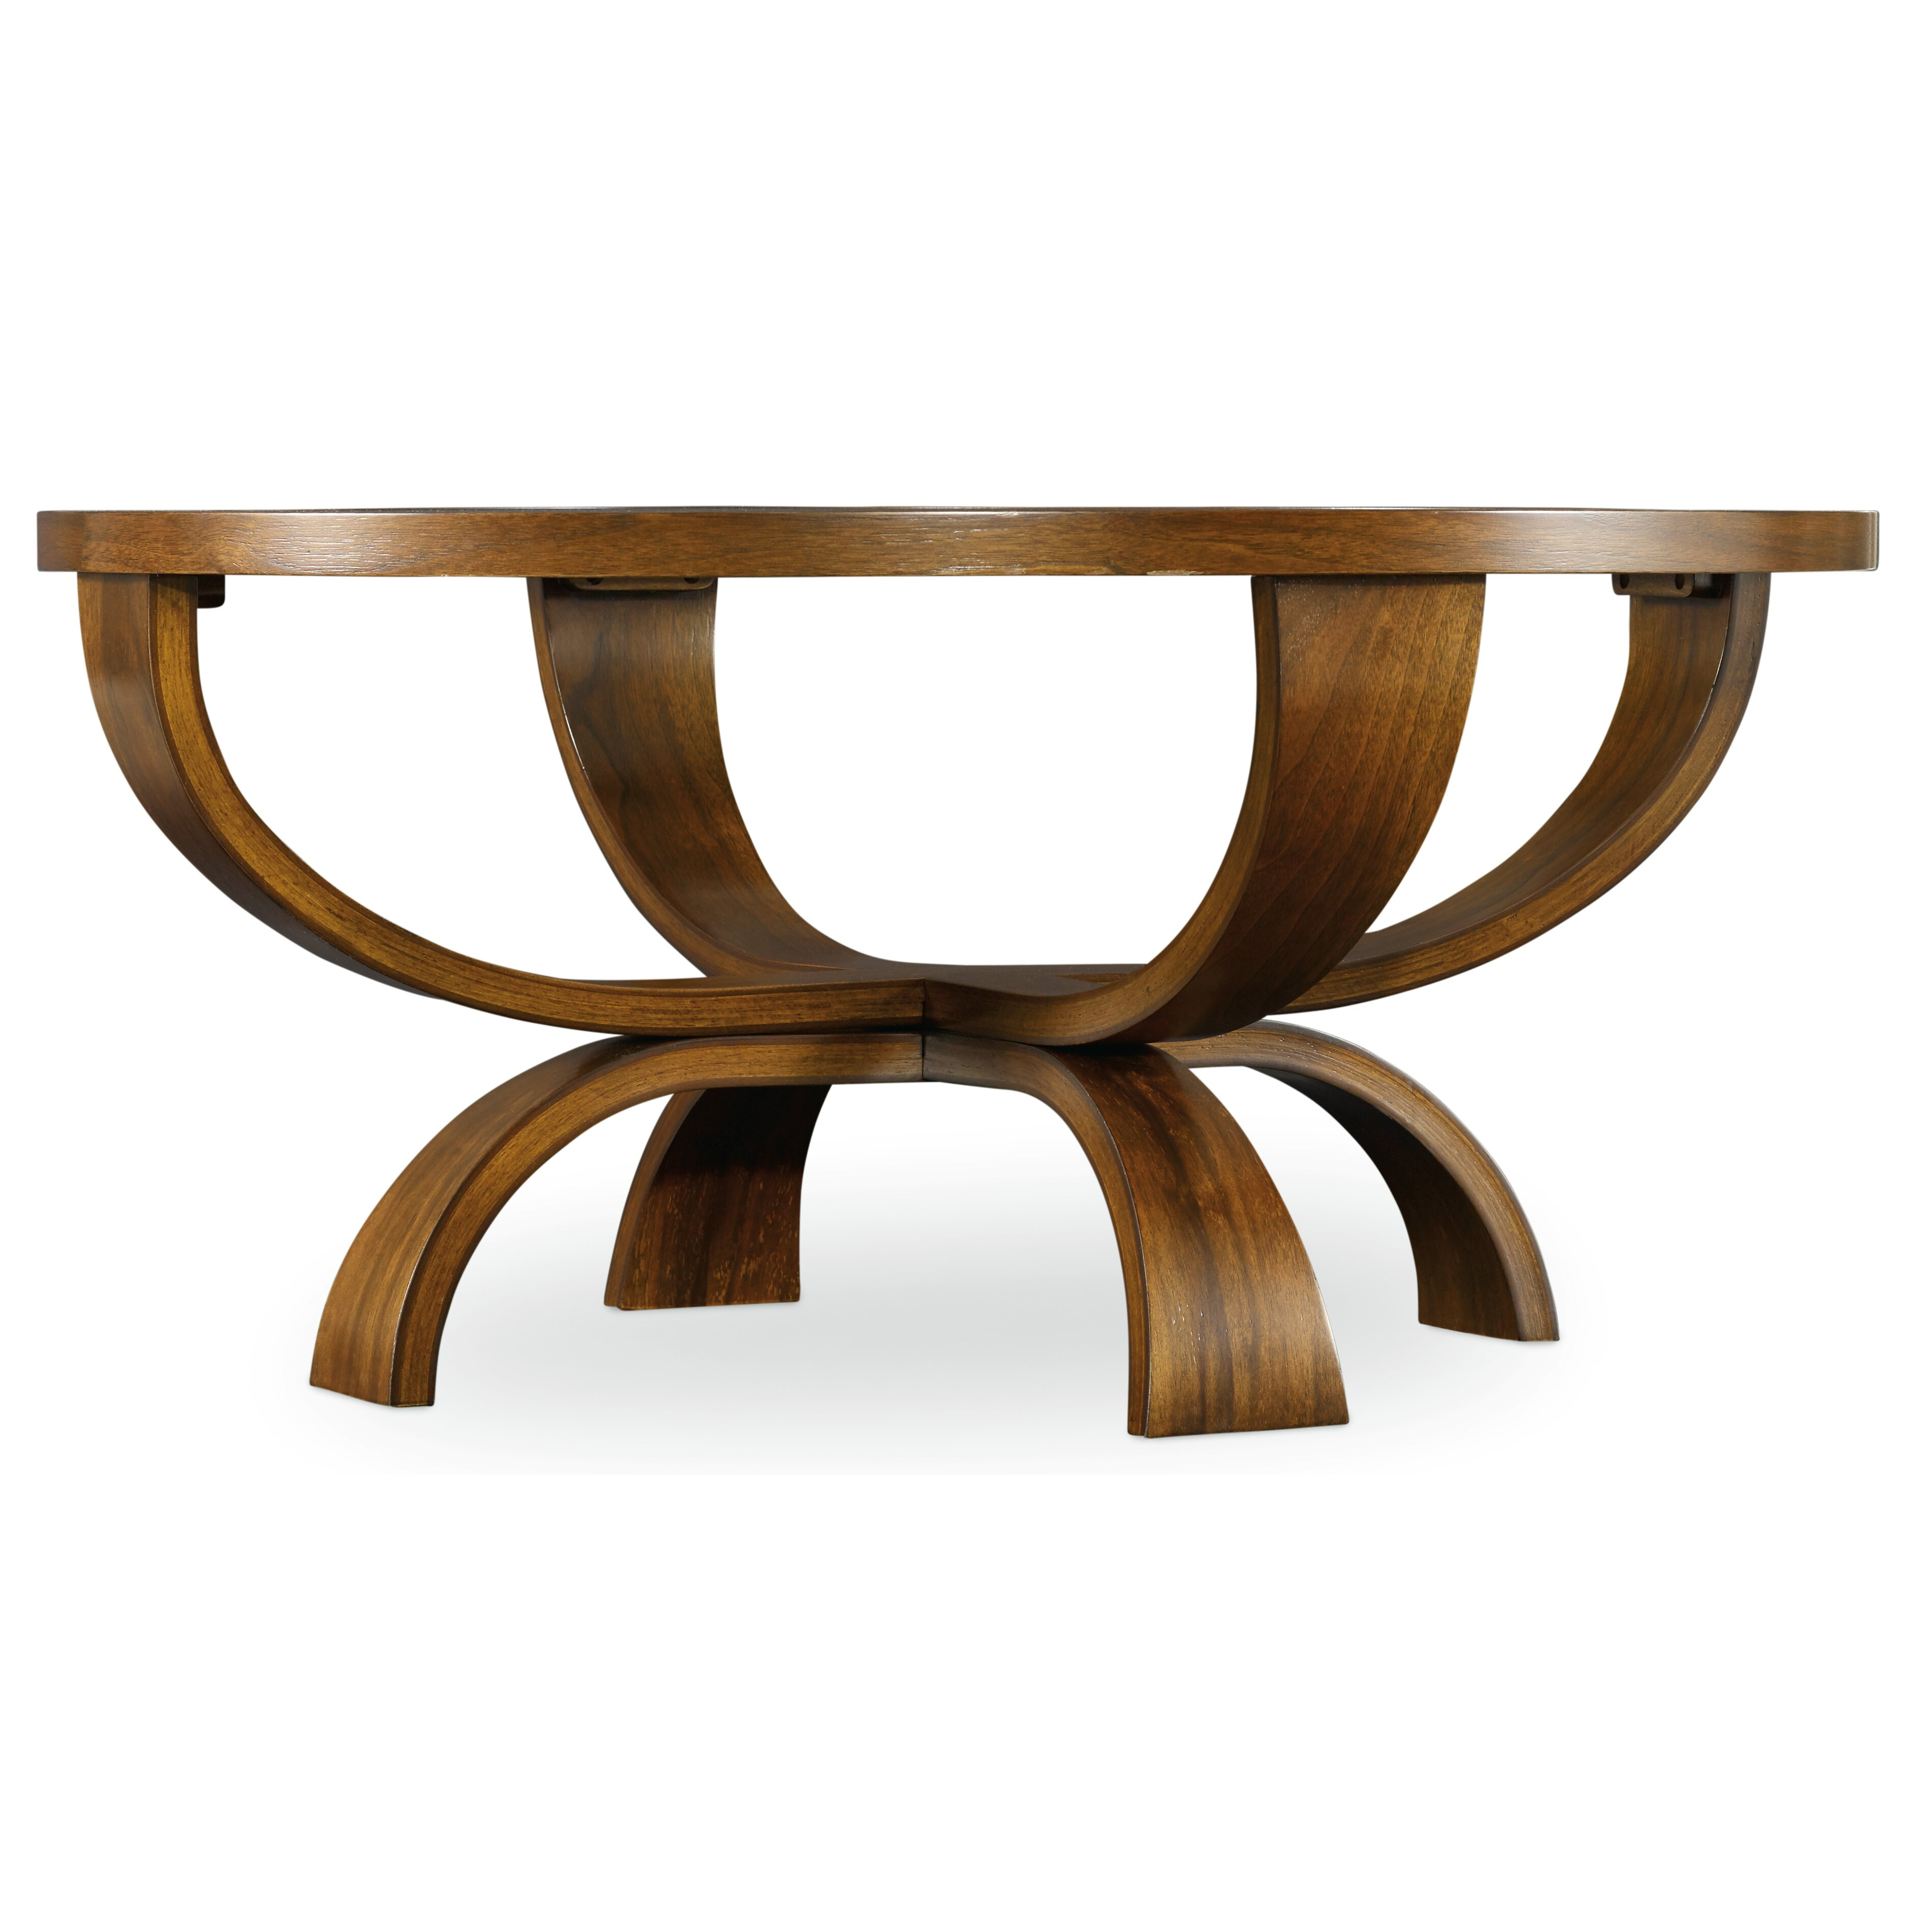 Https Www Wayfair Com Hooker Furniture Viewpoint Coffee Table Hkr10223 Html